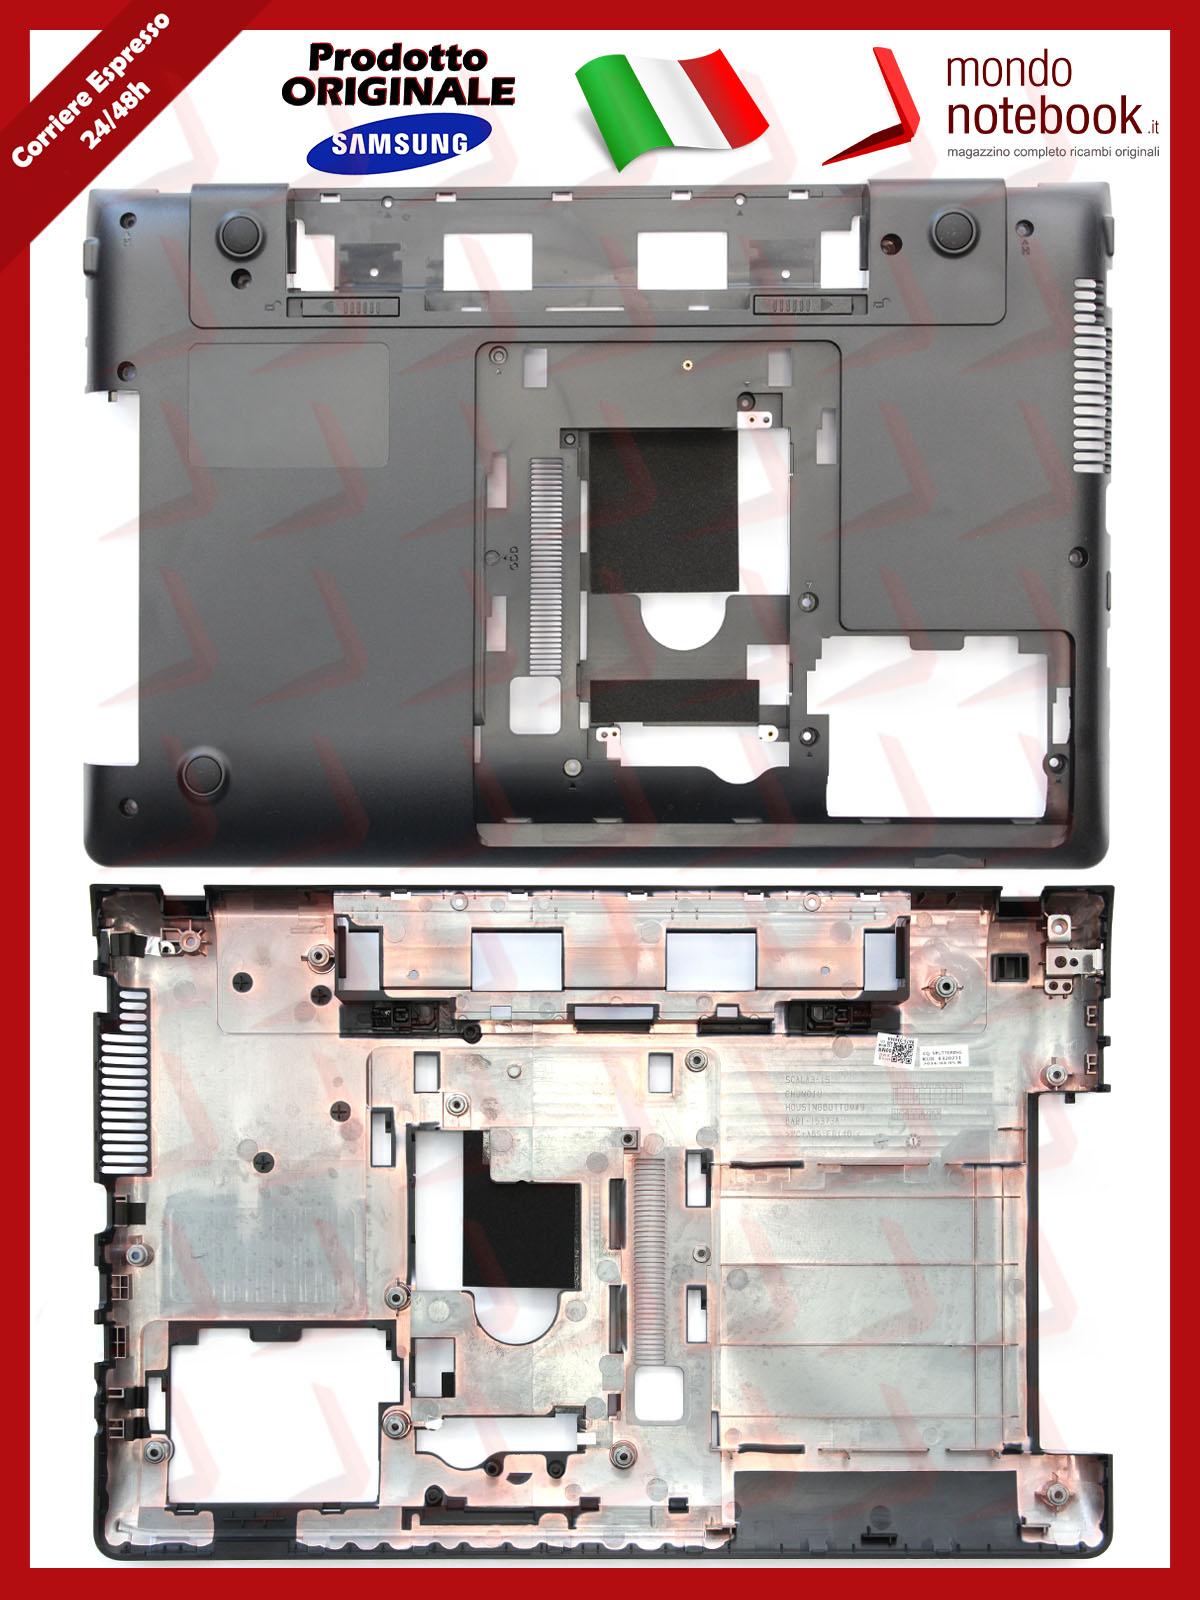 https://www.mondonotebook.it/5361/apple-iphone-5-charging-port-flex-cable-ribbon-replacement-black-grade-s-.jpg